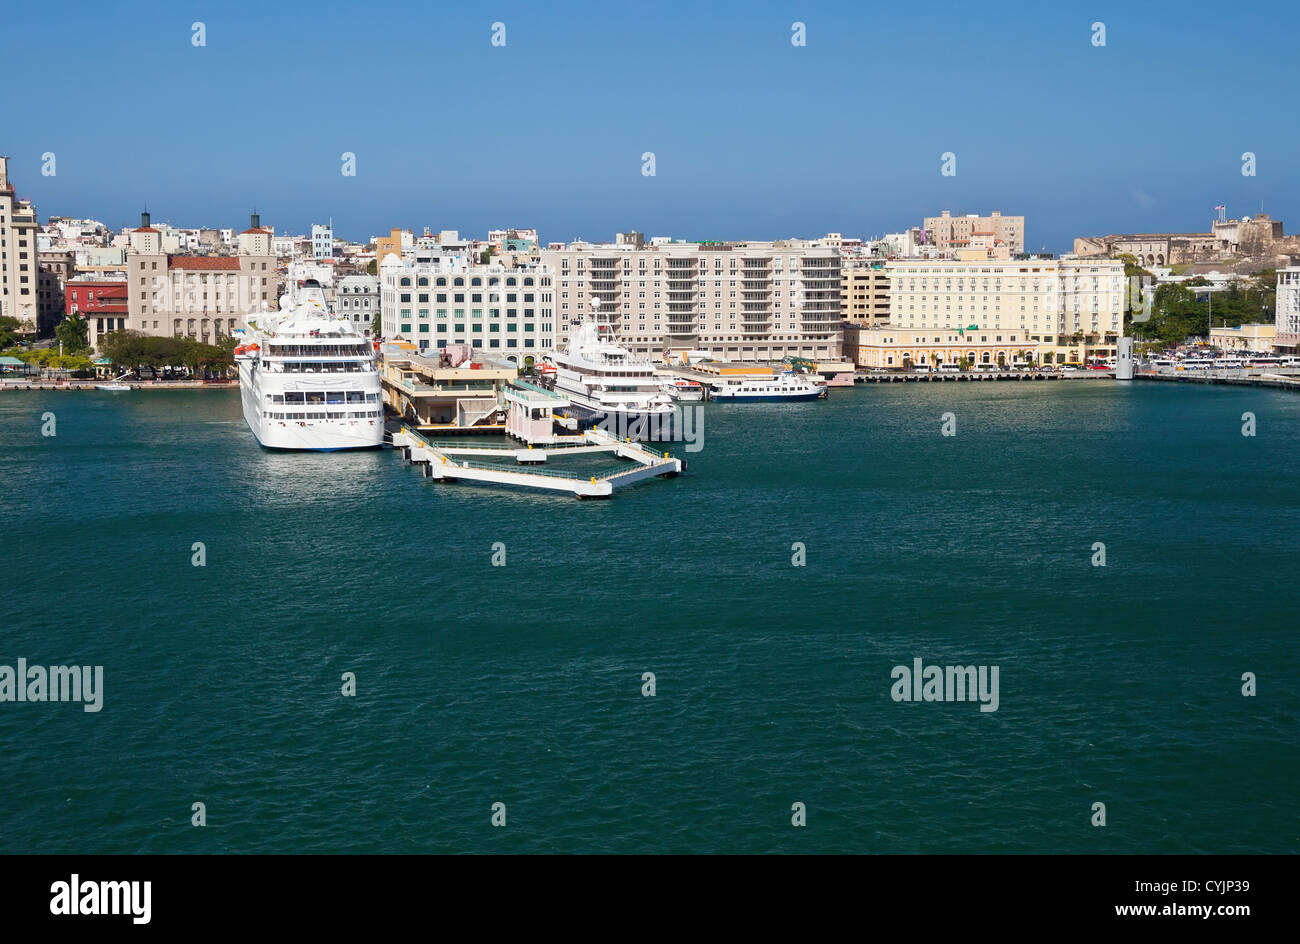 Cruise port, El Morro Castle and City of San Juan, Puerto Rico - Stock Image